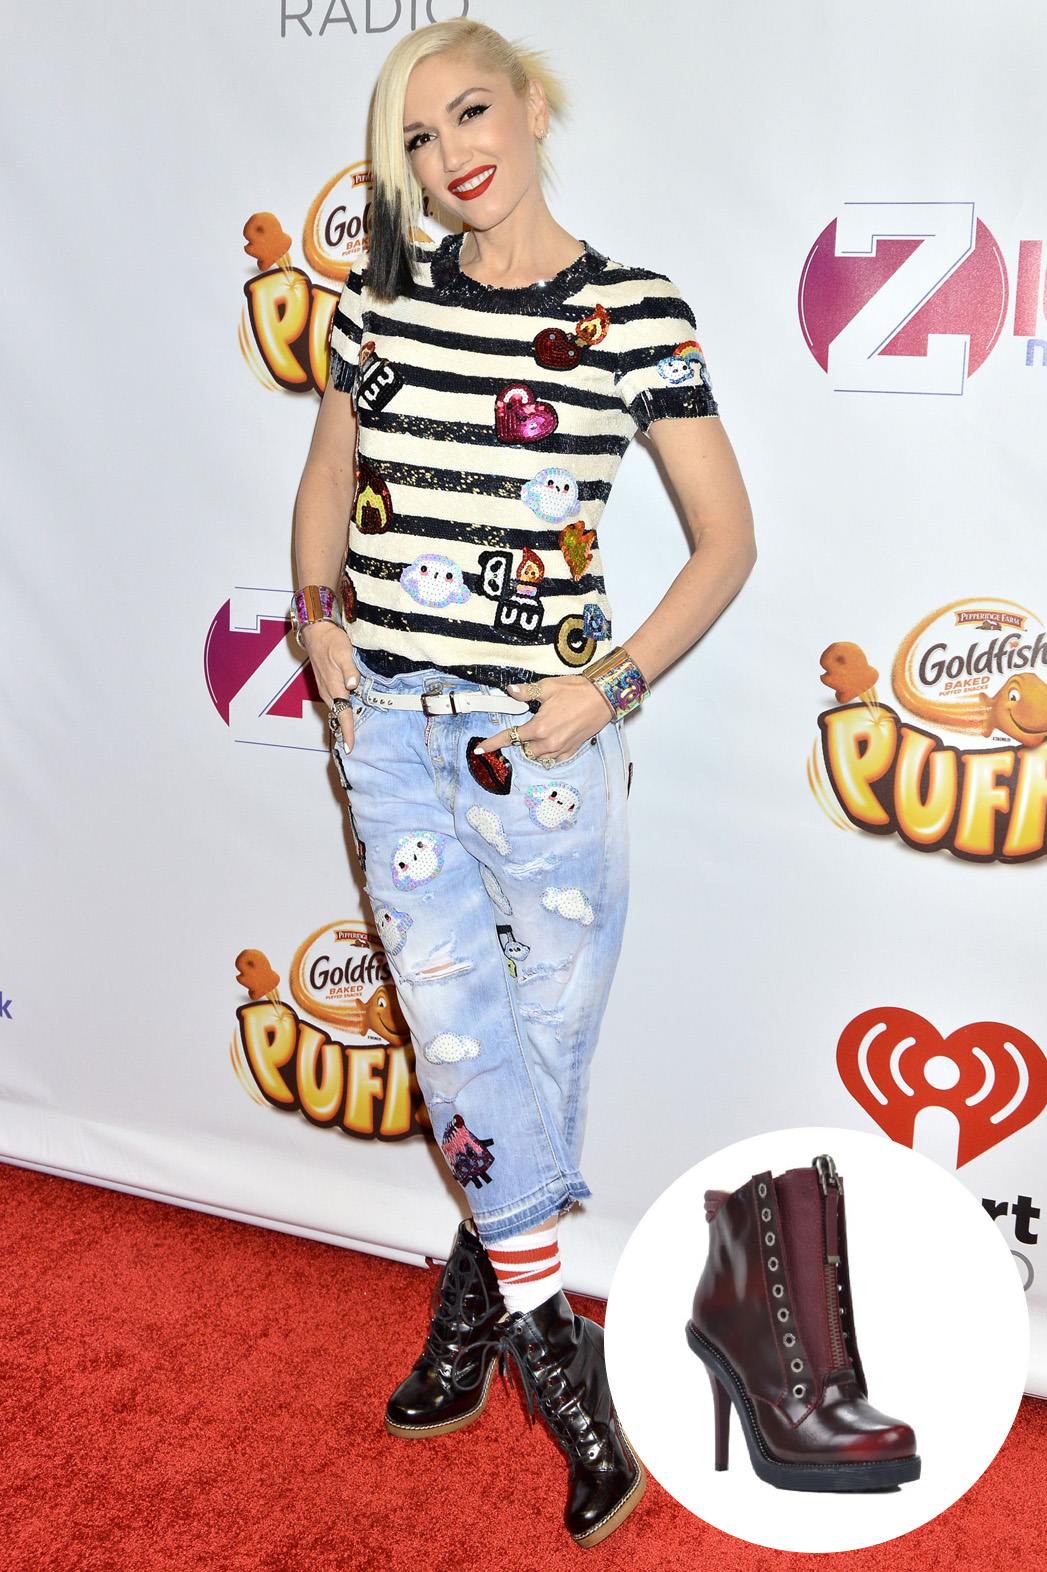 Gwen Stefani Shoe Inset - P 2014